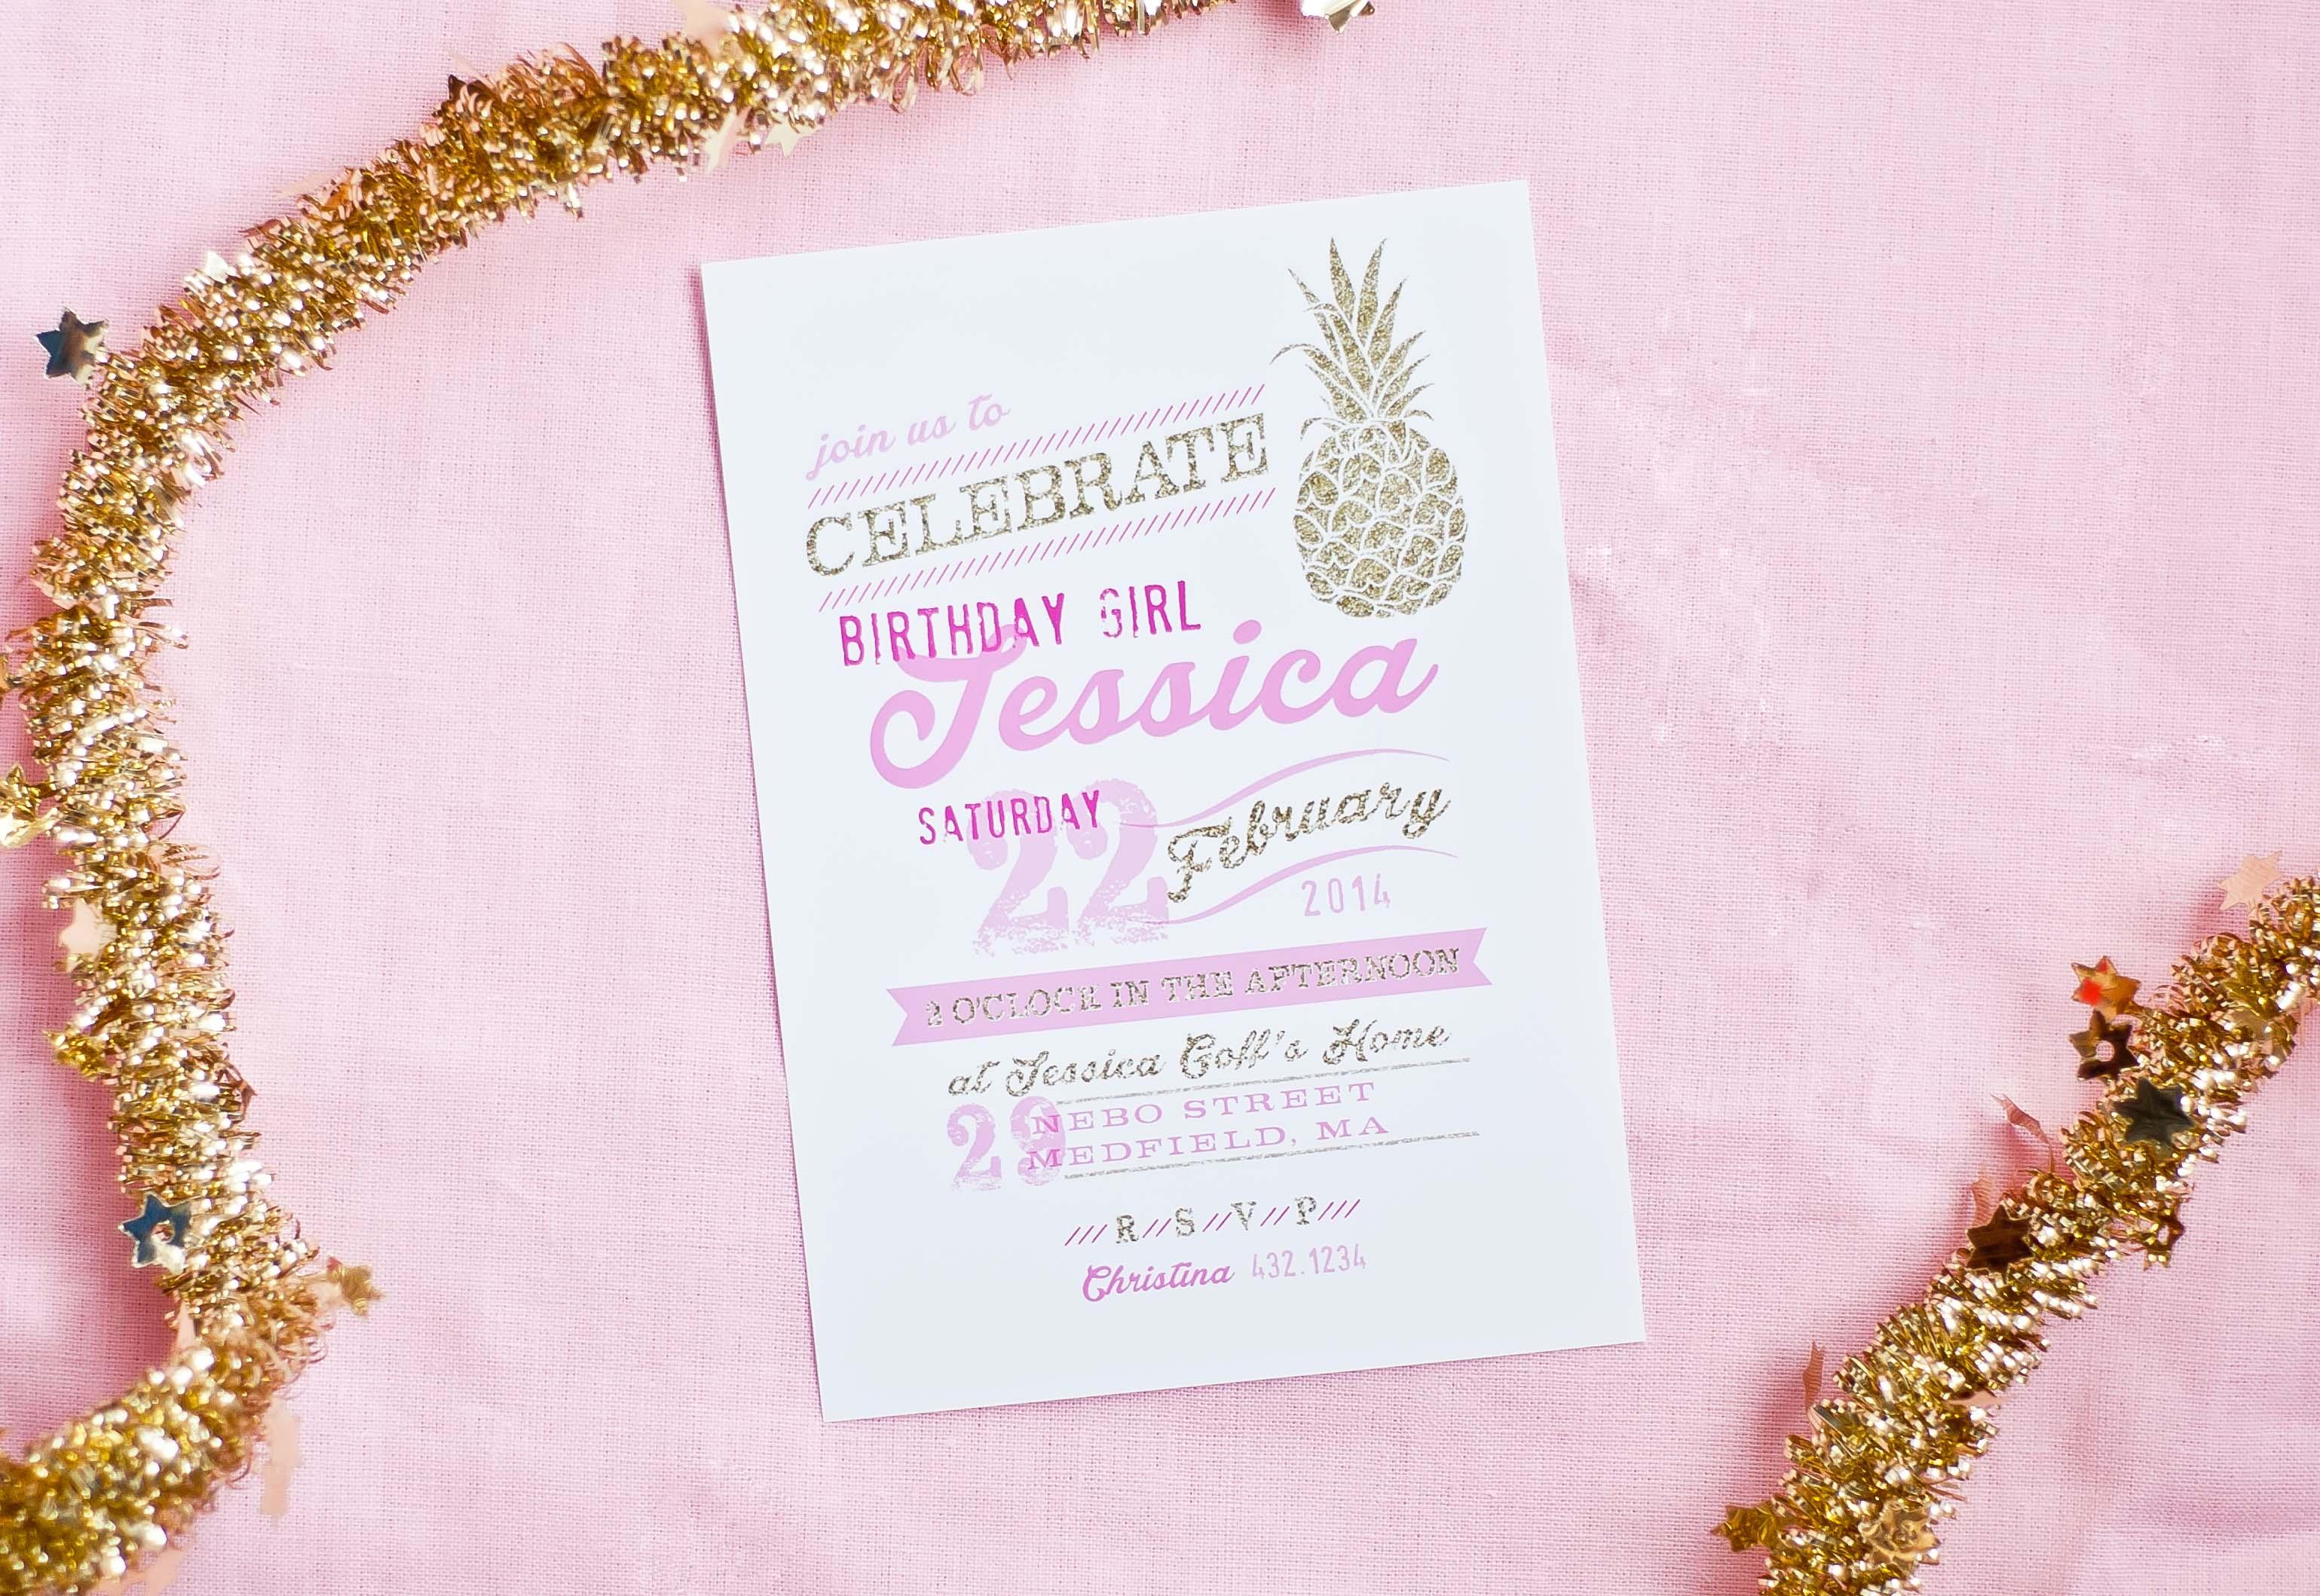 New Theme: Pineapple Party Invitations - Anders Ruff Custom Designs, Llc - Free Printable Pineapple Invitations